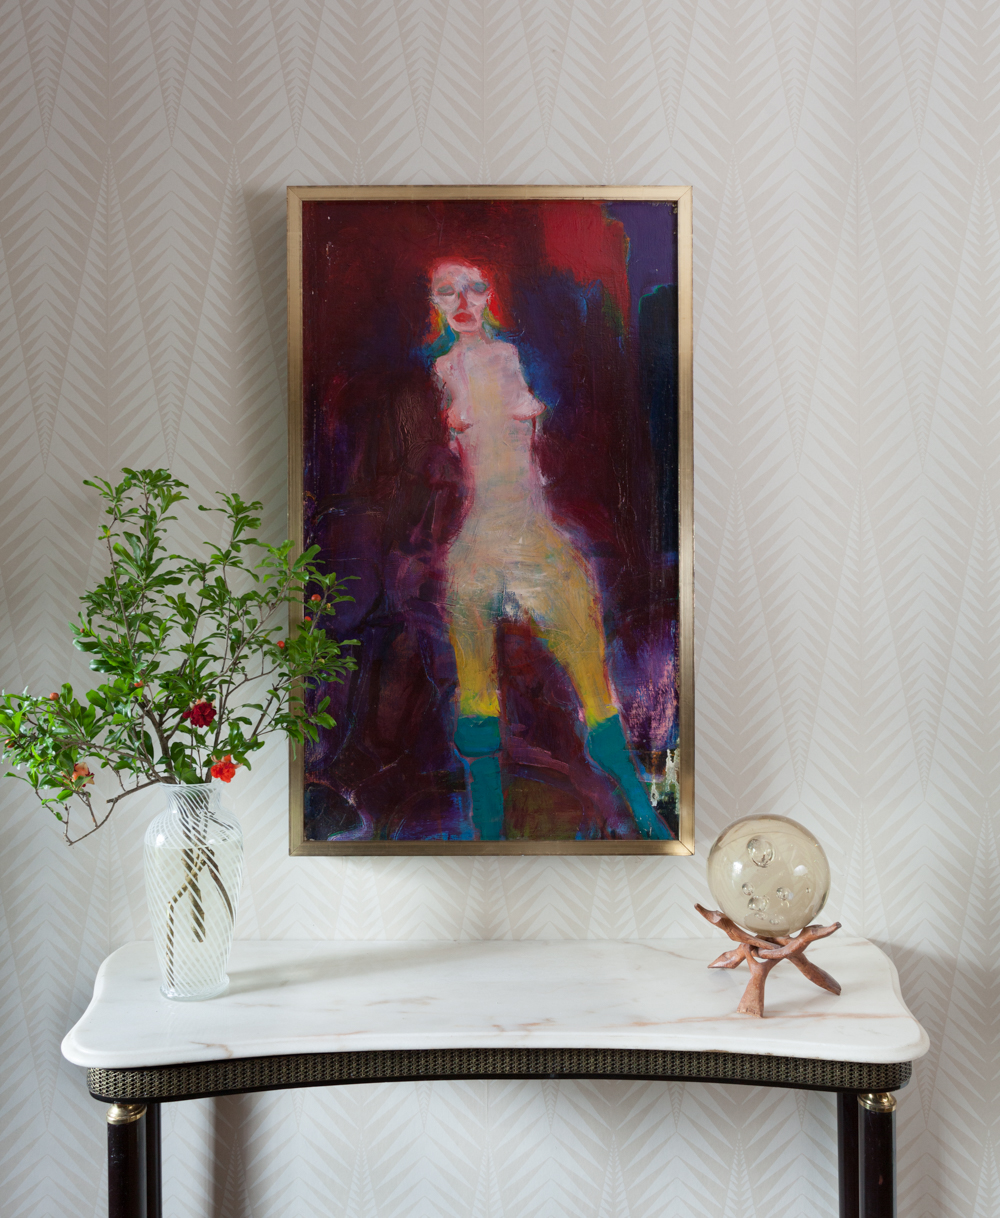 Martin Sumers painting and Neisha Crosland zebra wallpaper. Tone on tone